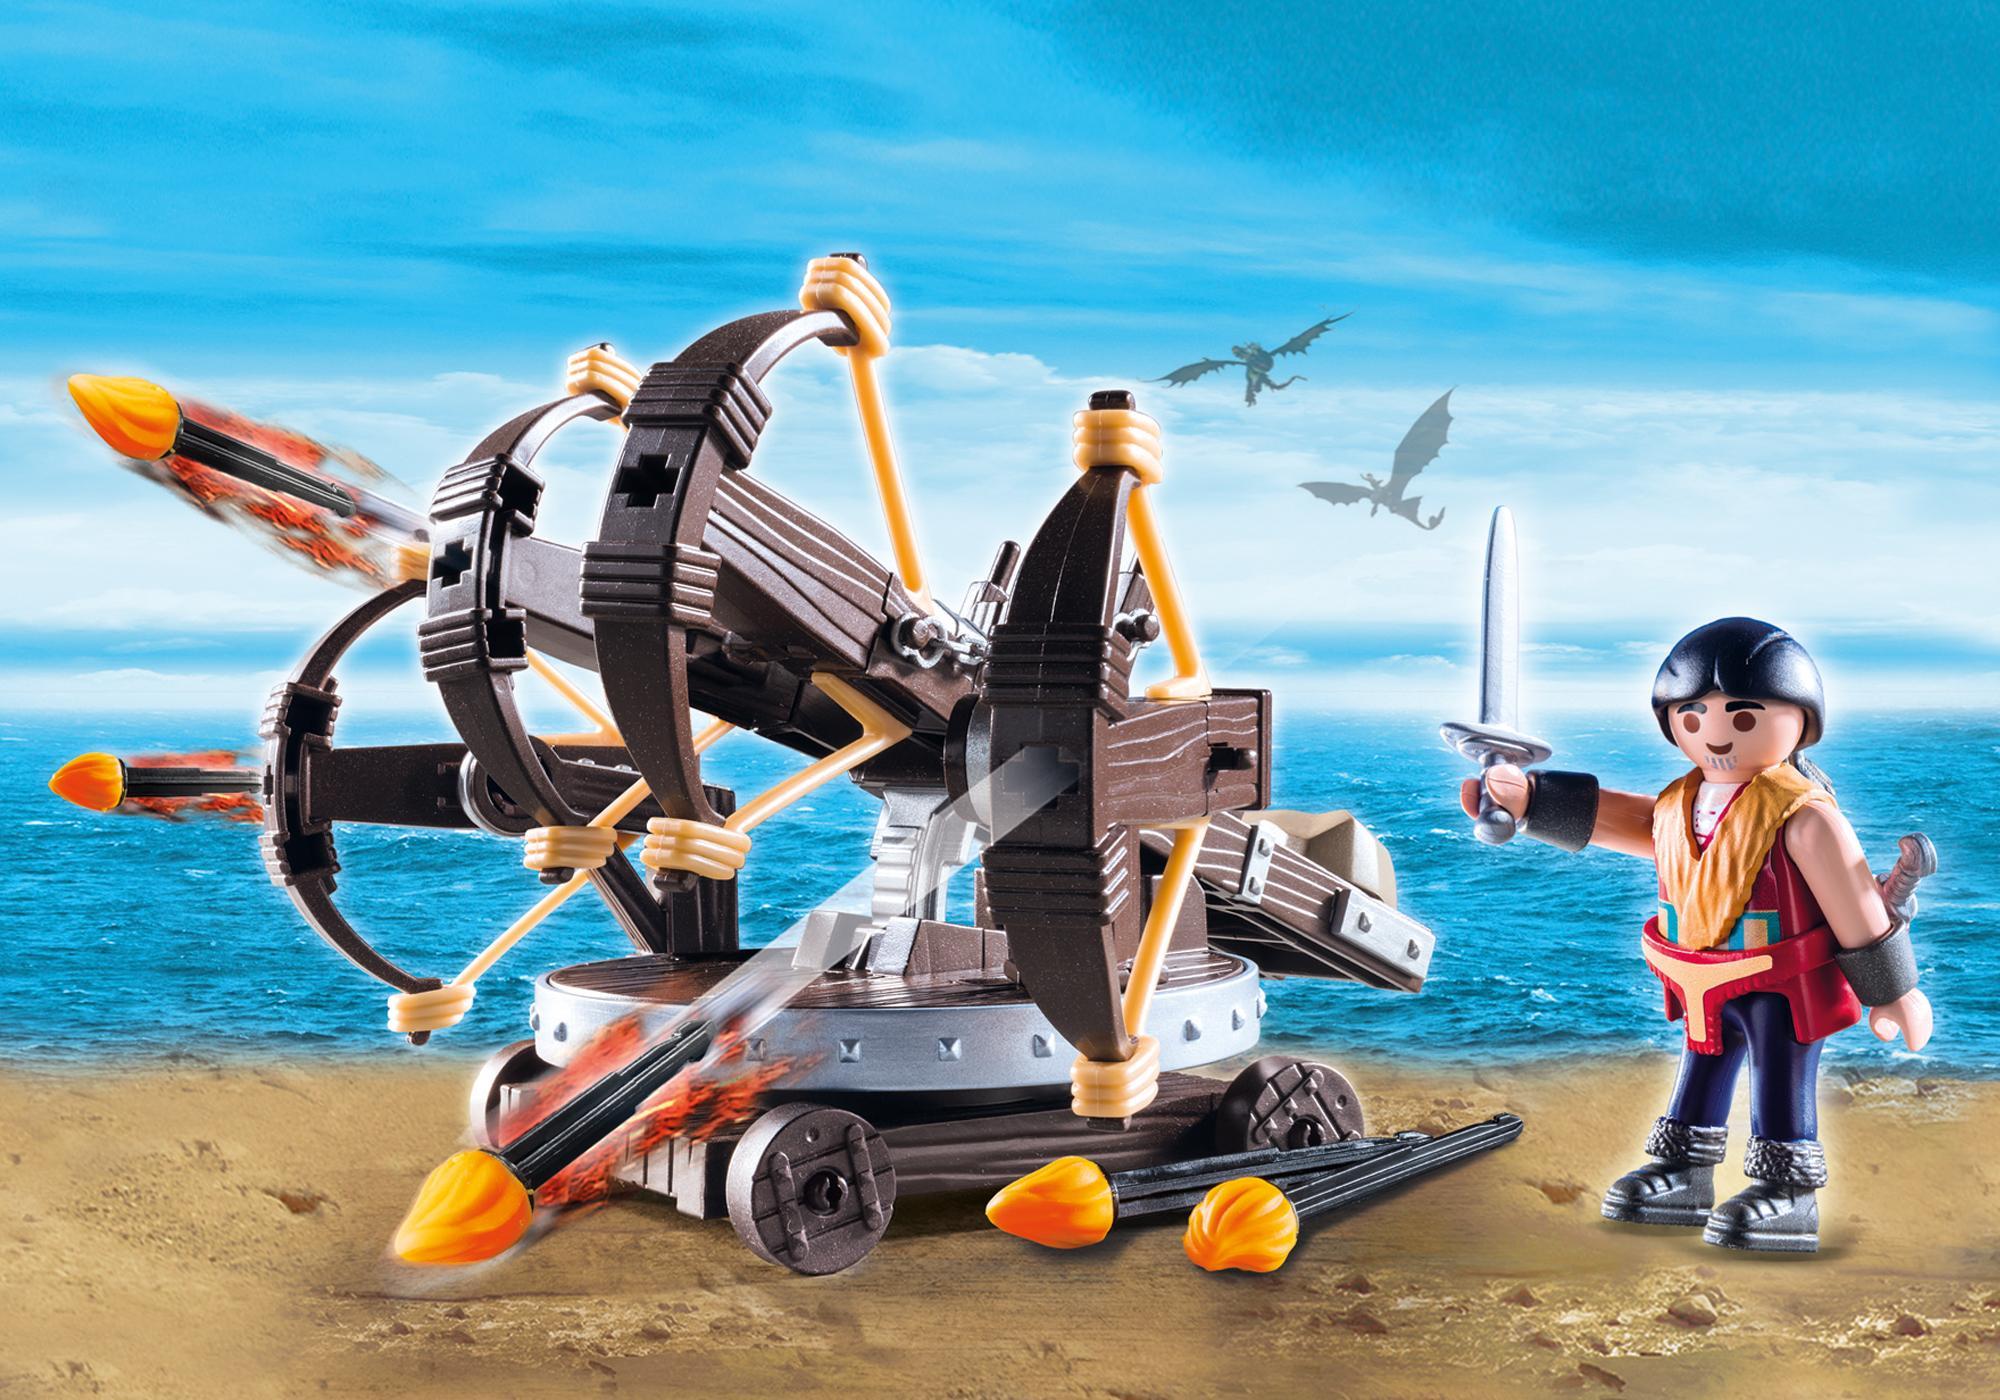 http://media.playmobil.com/i/playmobil/9249_product_detail/Eret mit 4-Schuss-Feuer-Balliste